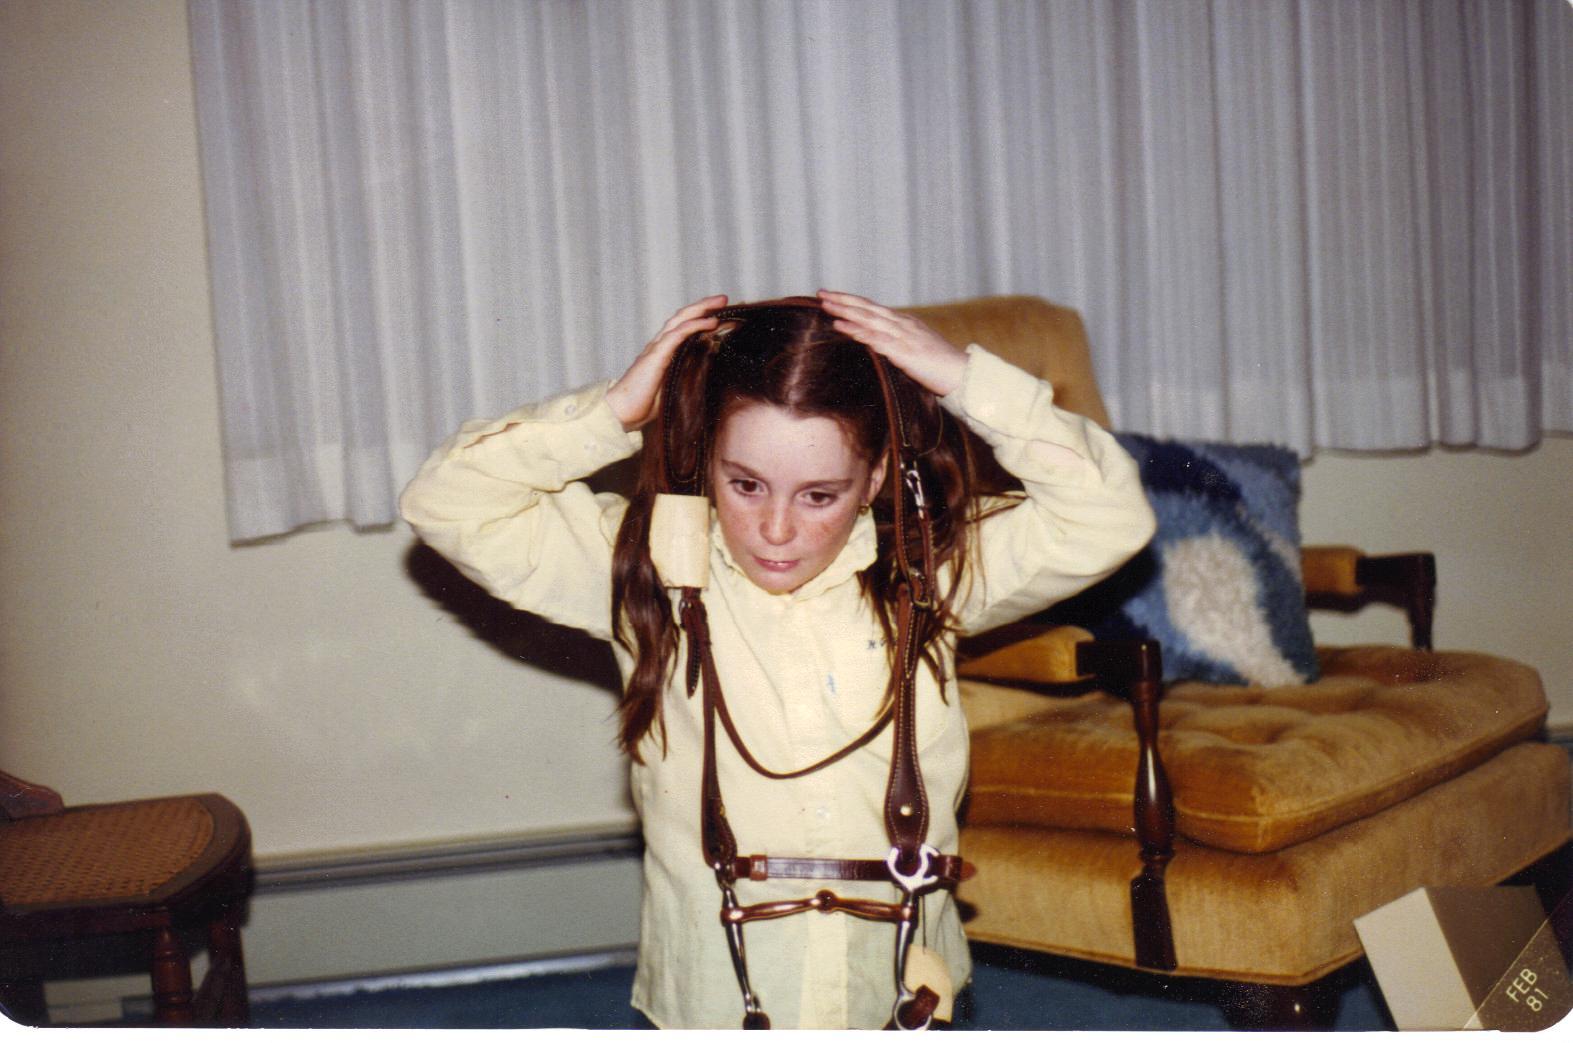 Heidi As Child (1).jpg